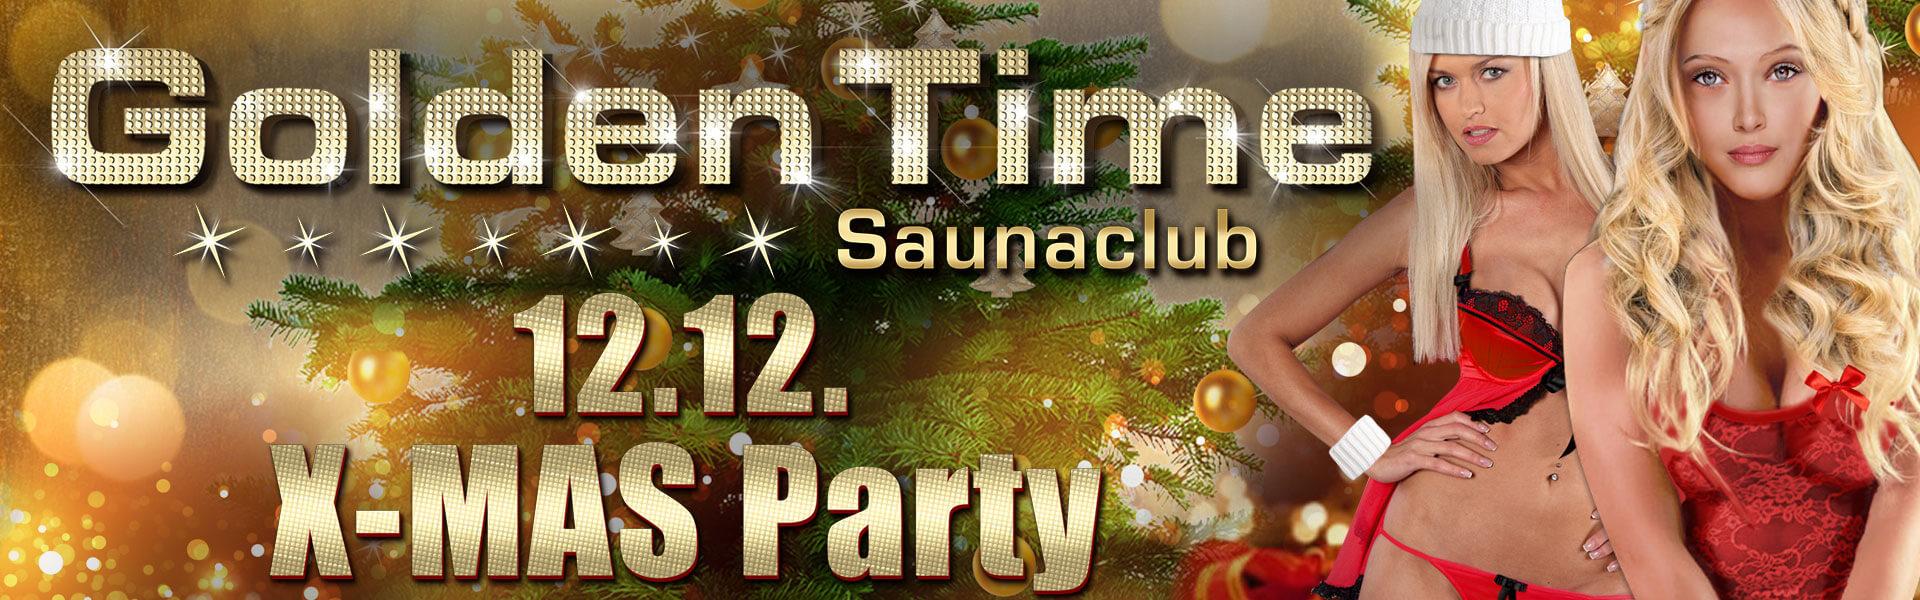 X-MAS Party am 12.12.2016 im GoldenTime FKK Saunaclub, Brüggen (NRW)